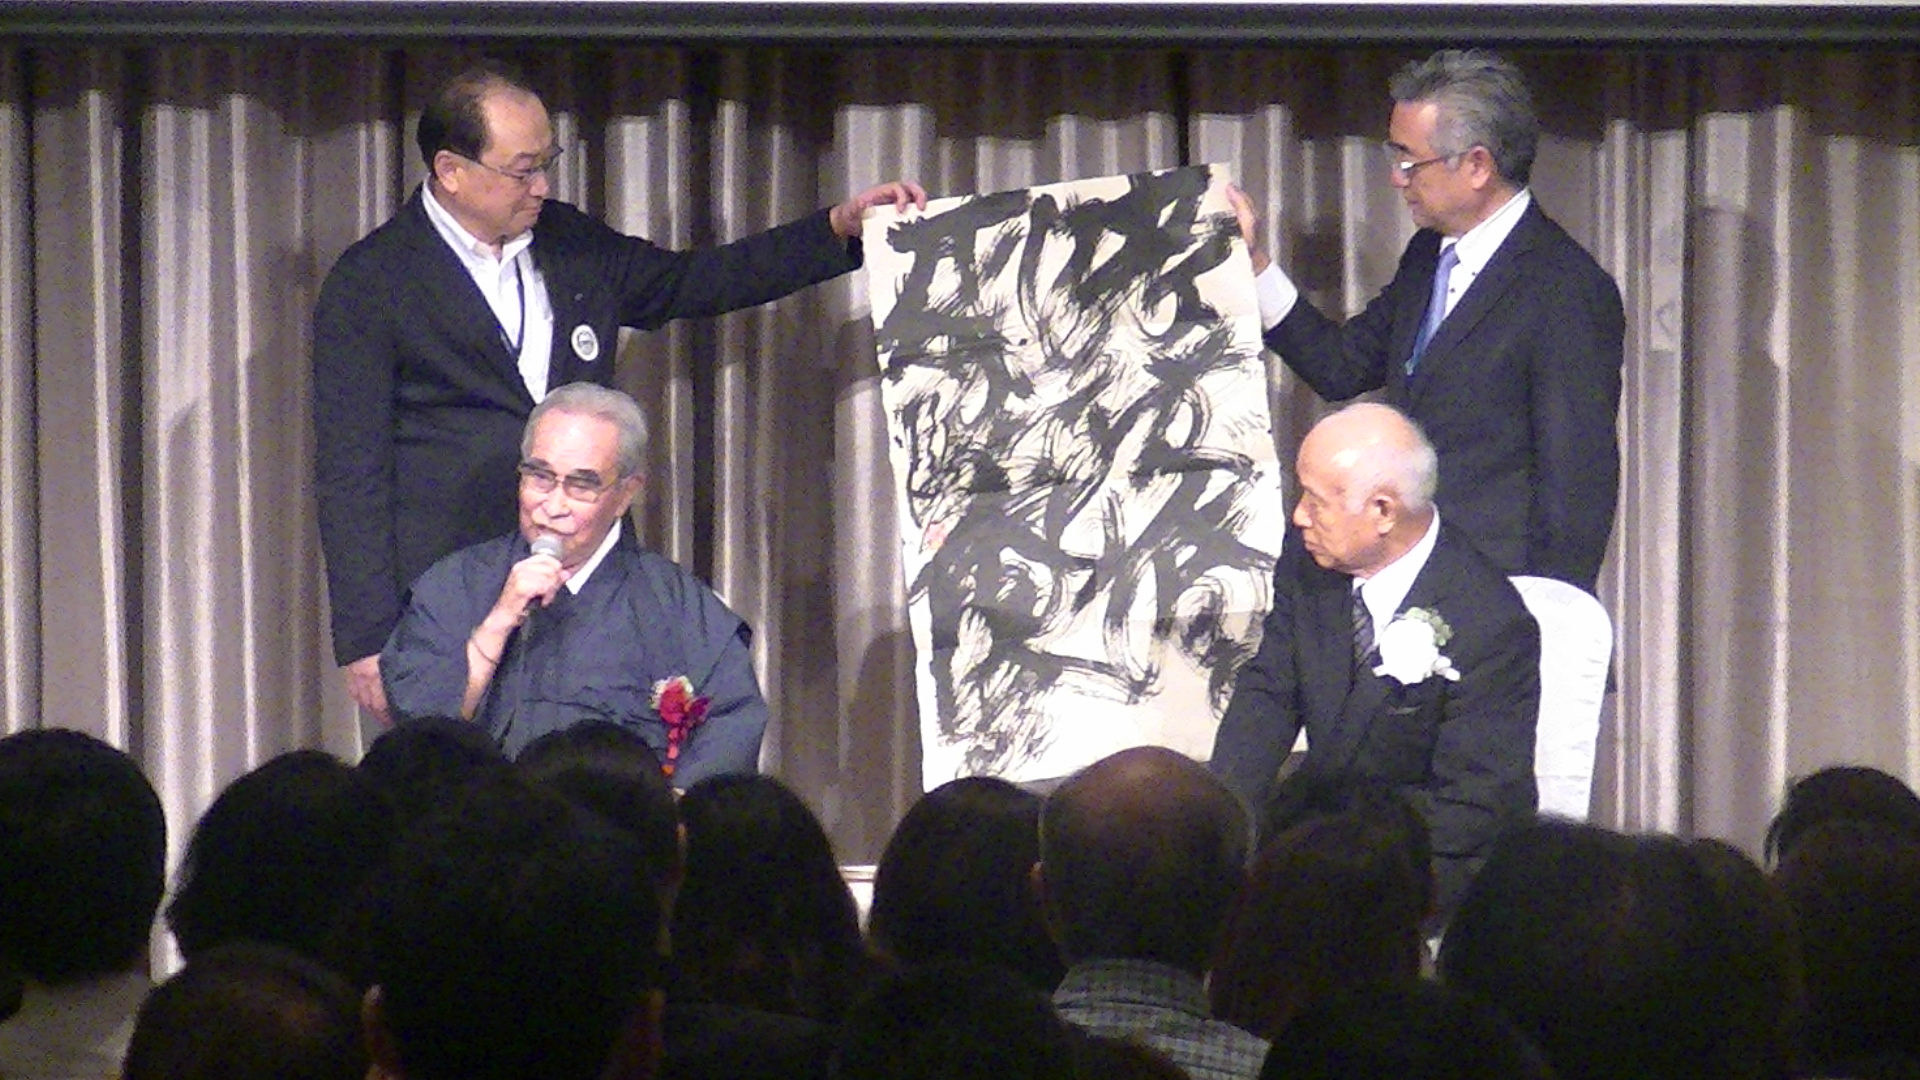 PIC 1809 - 2018年12月1日(土)第6回東京思風塾開催します。